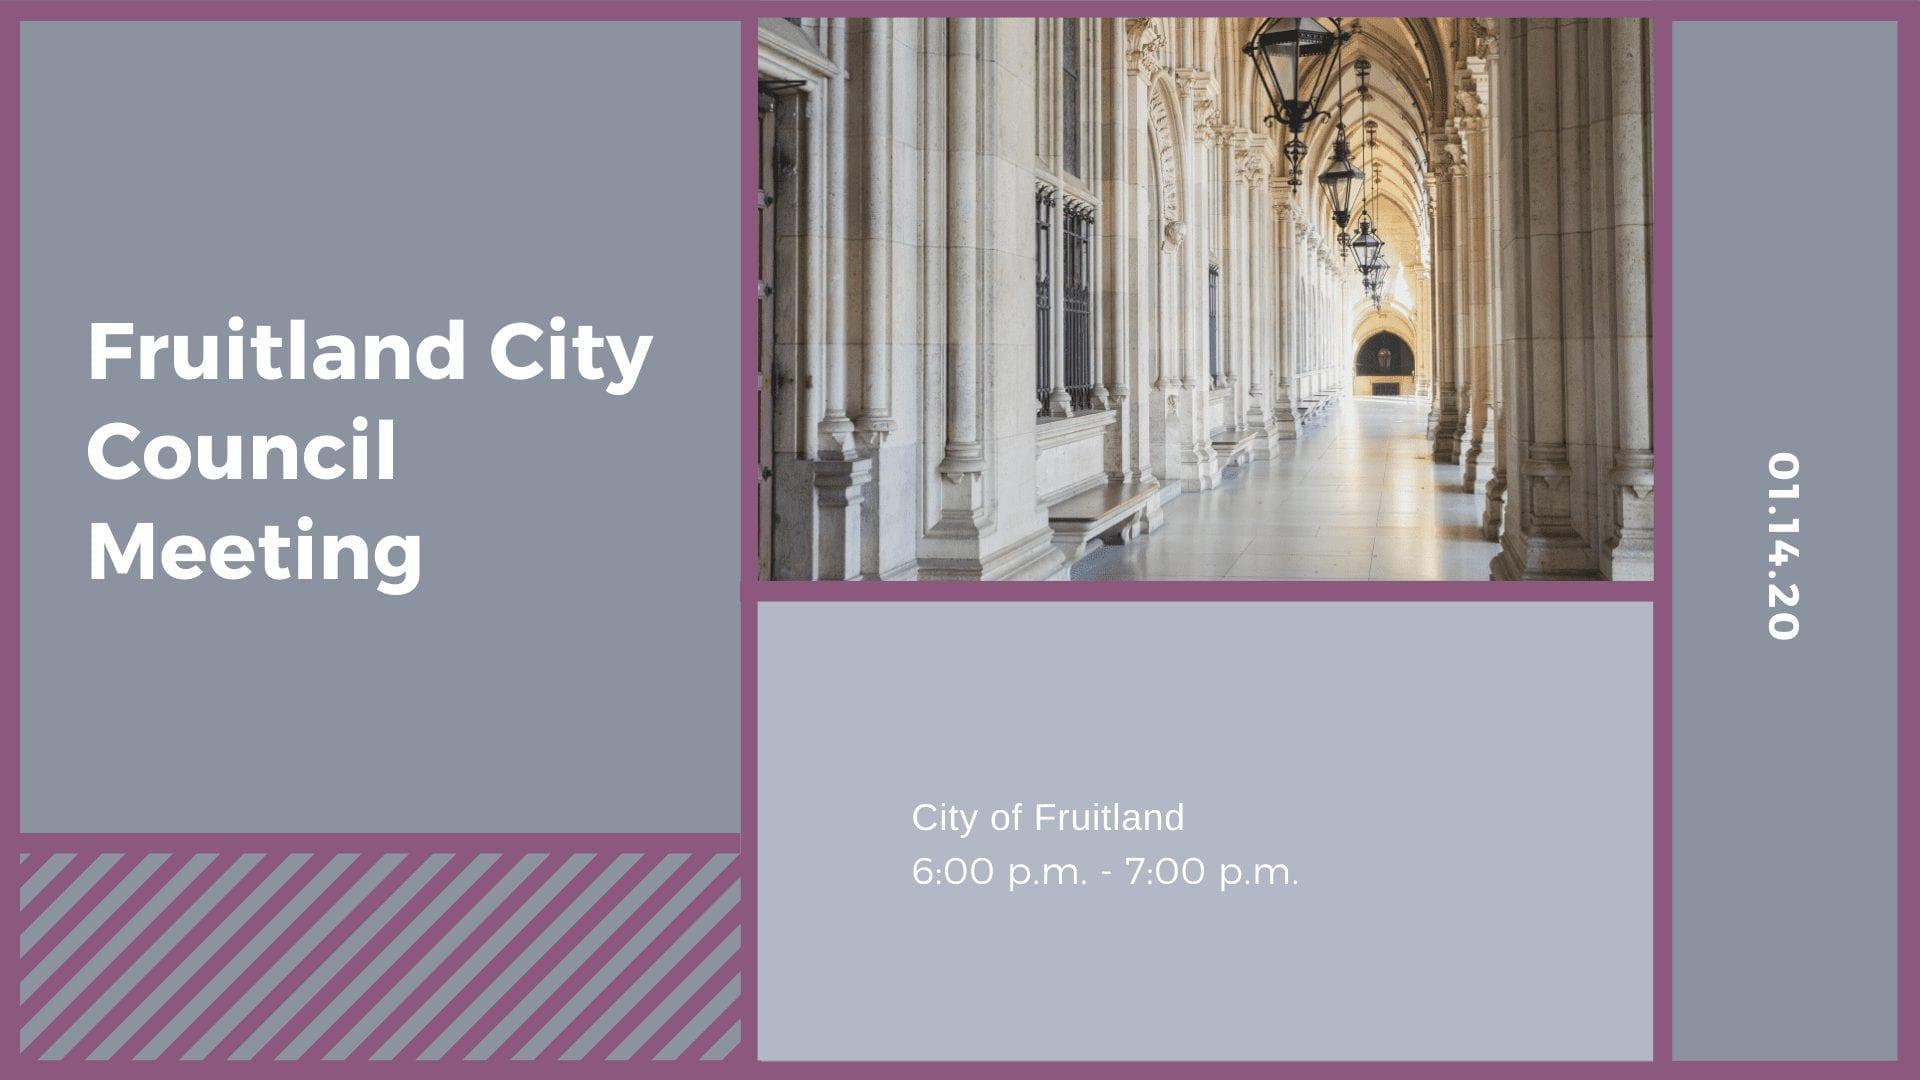 Fruitland City Council Meeting